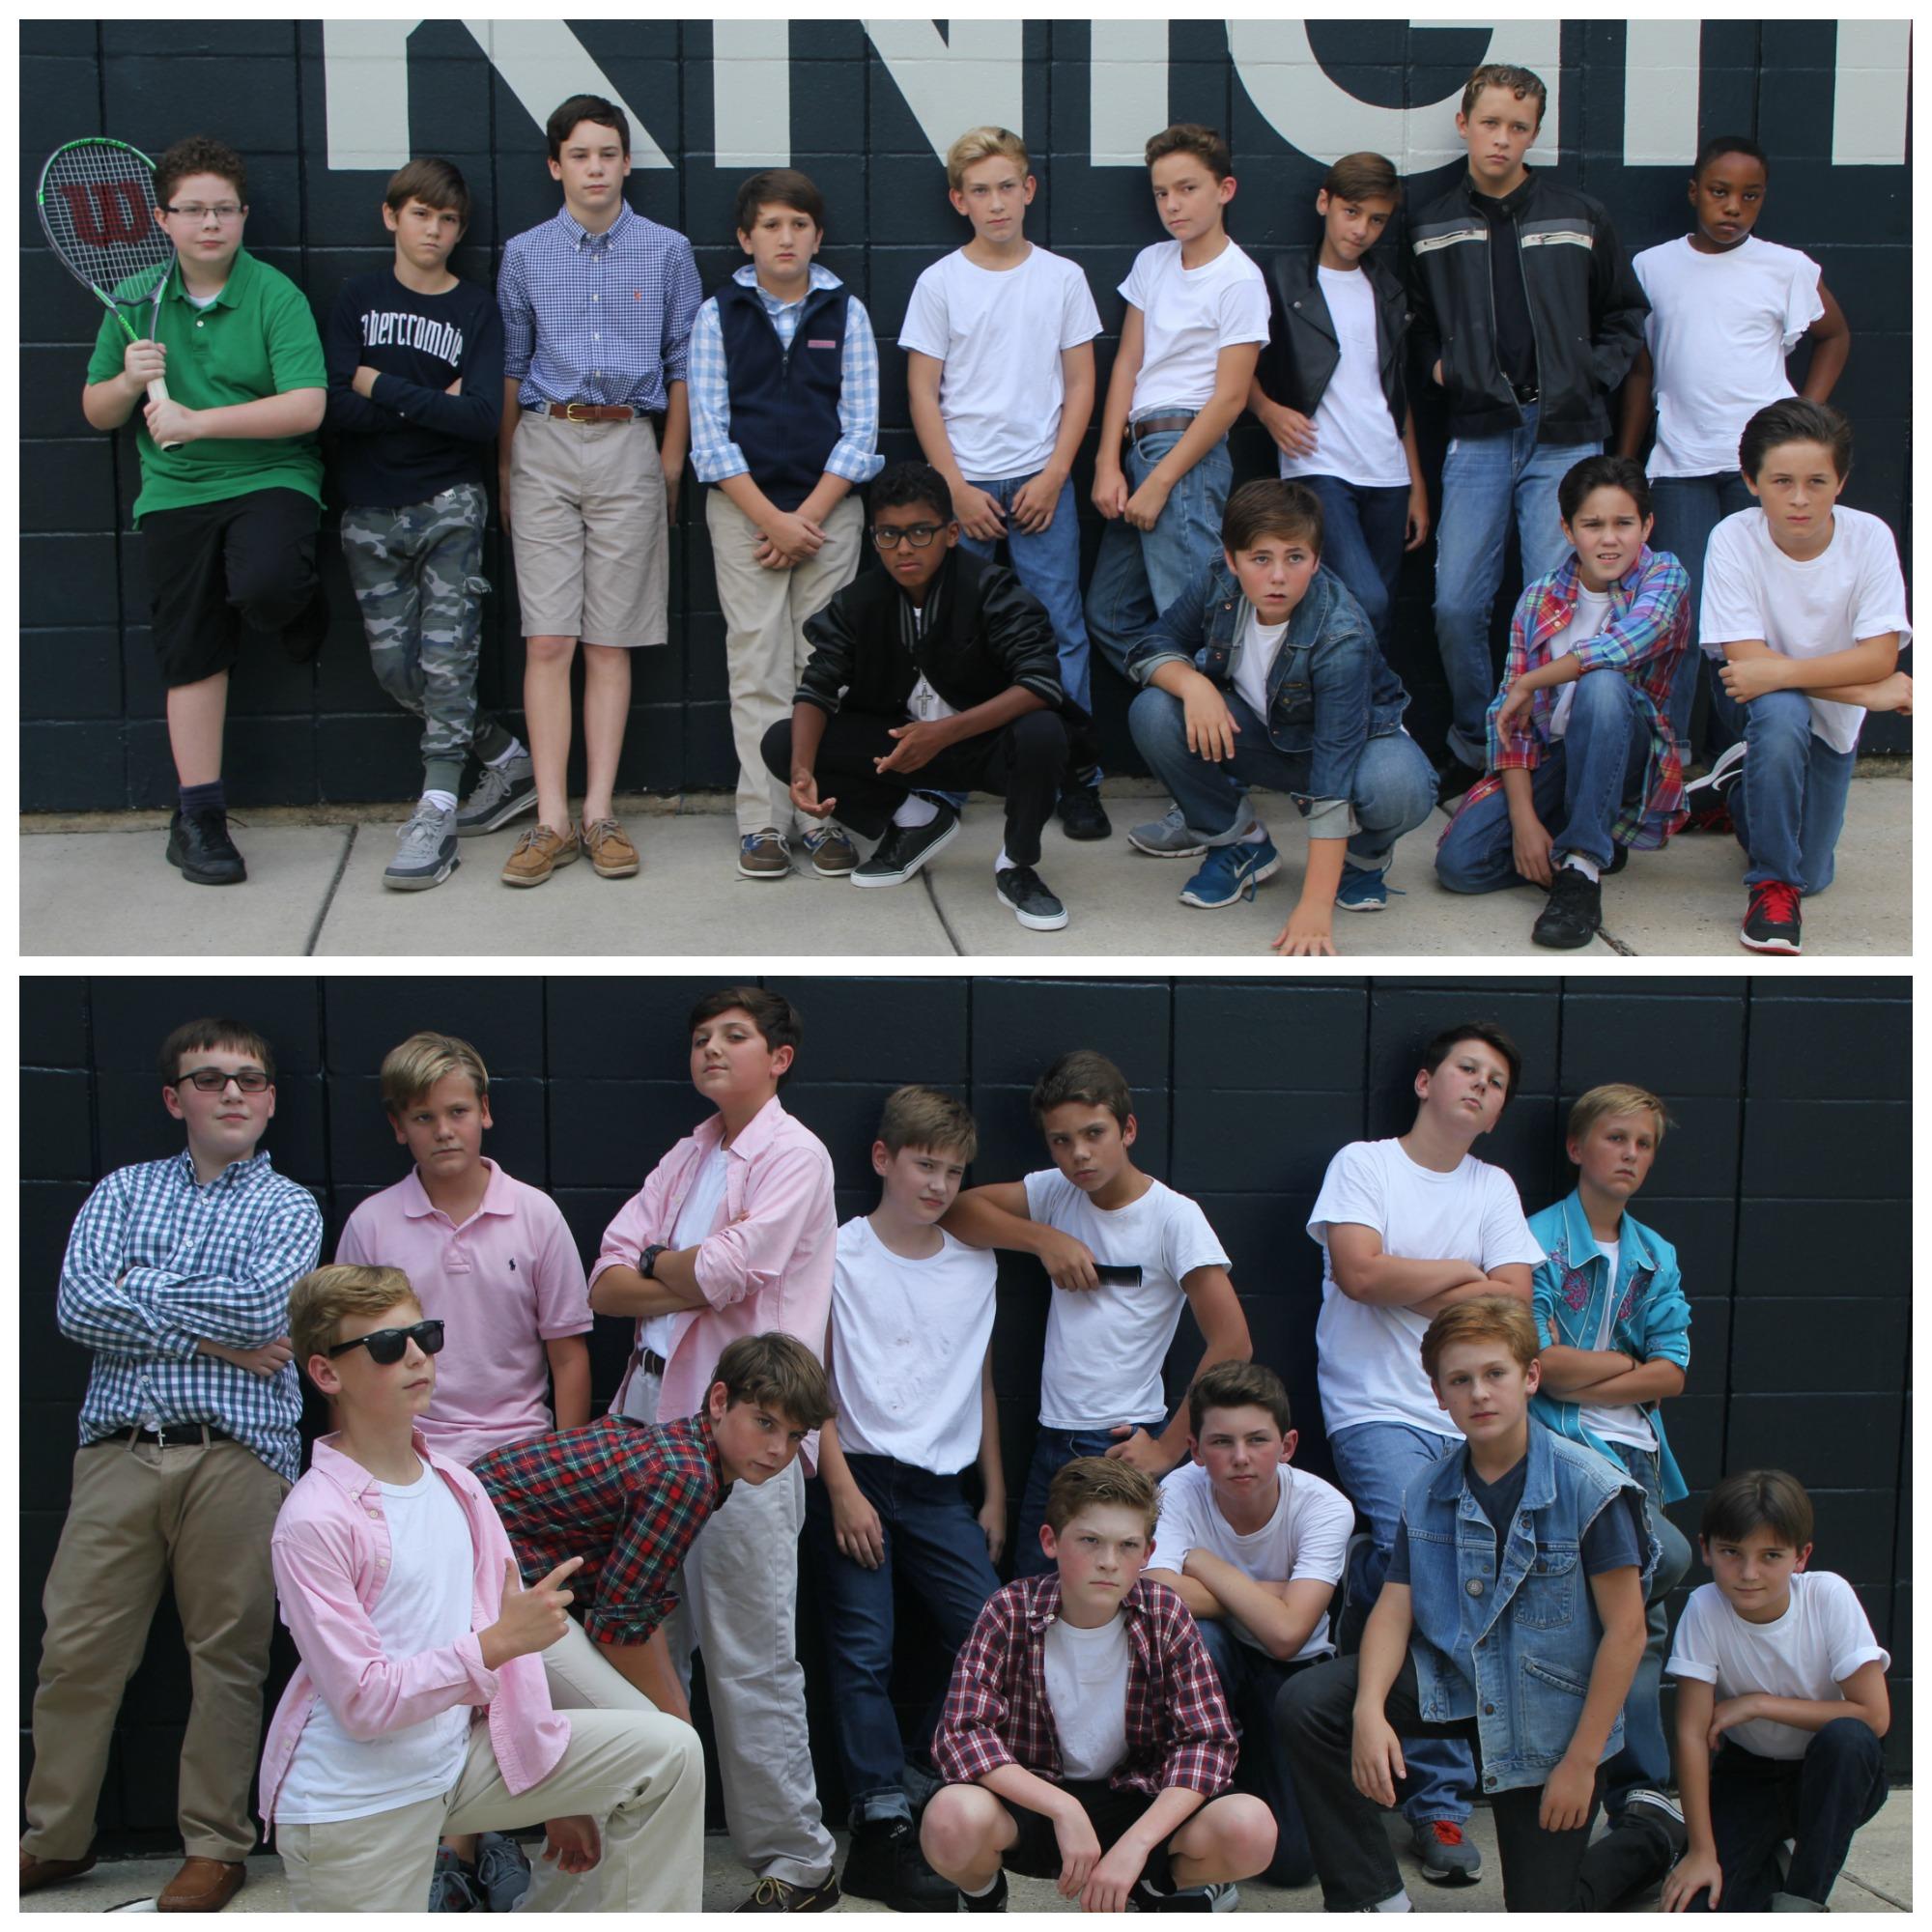 outsiders group photos.jpg